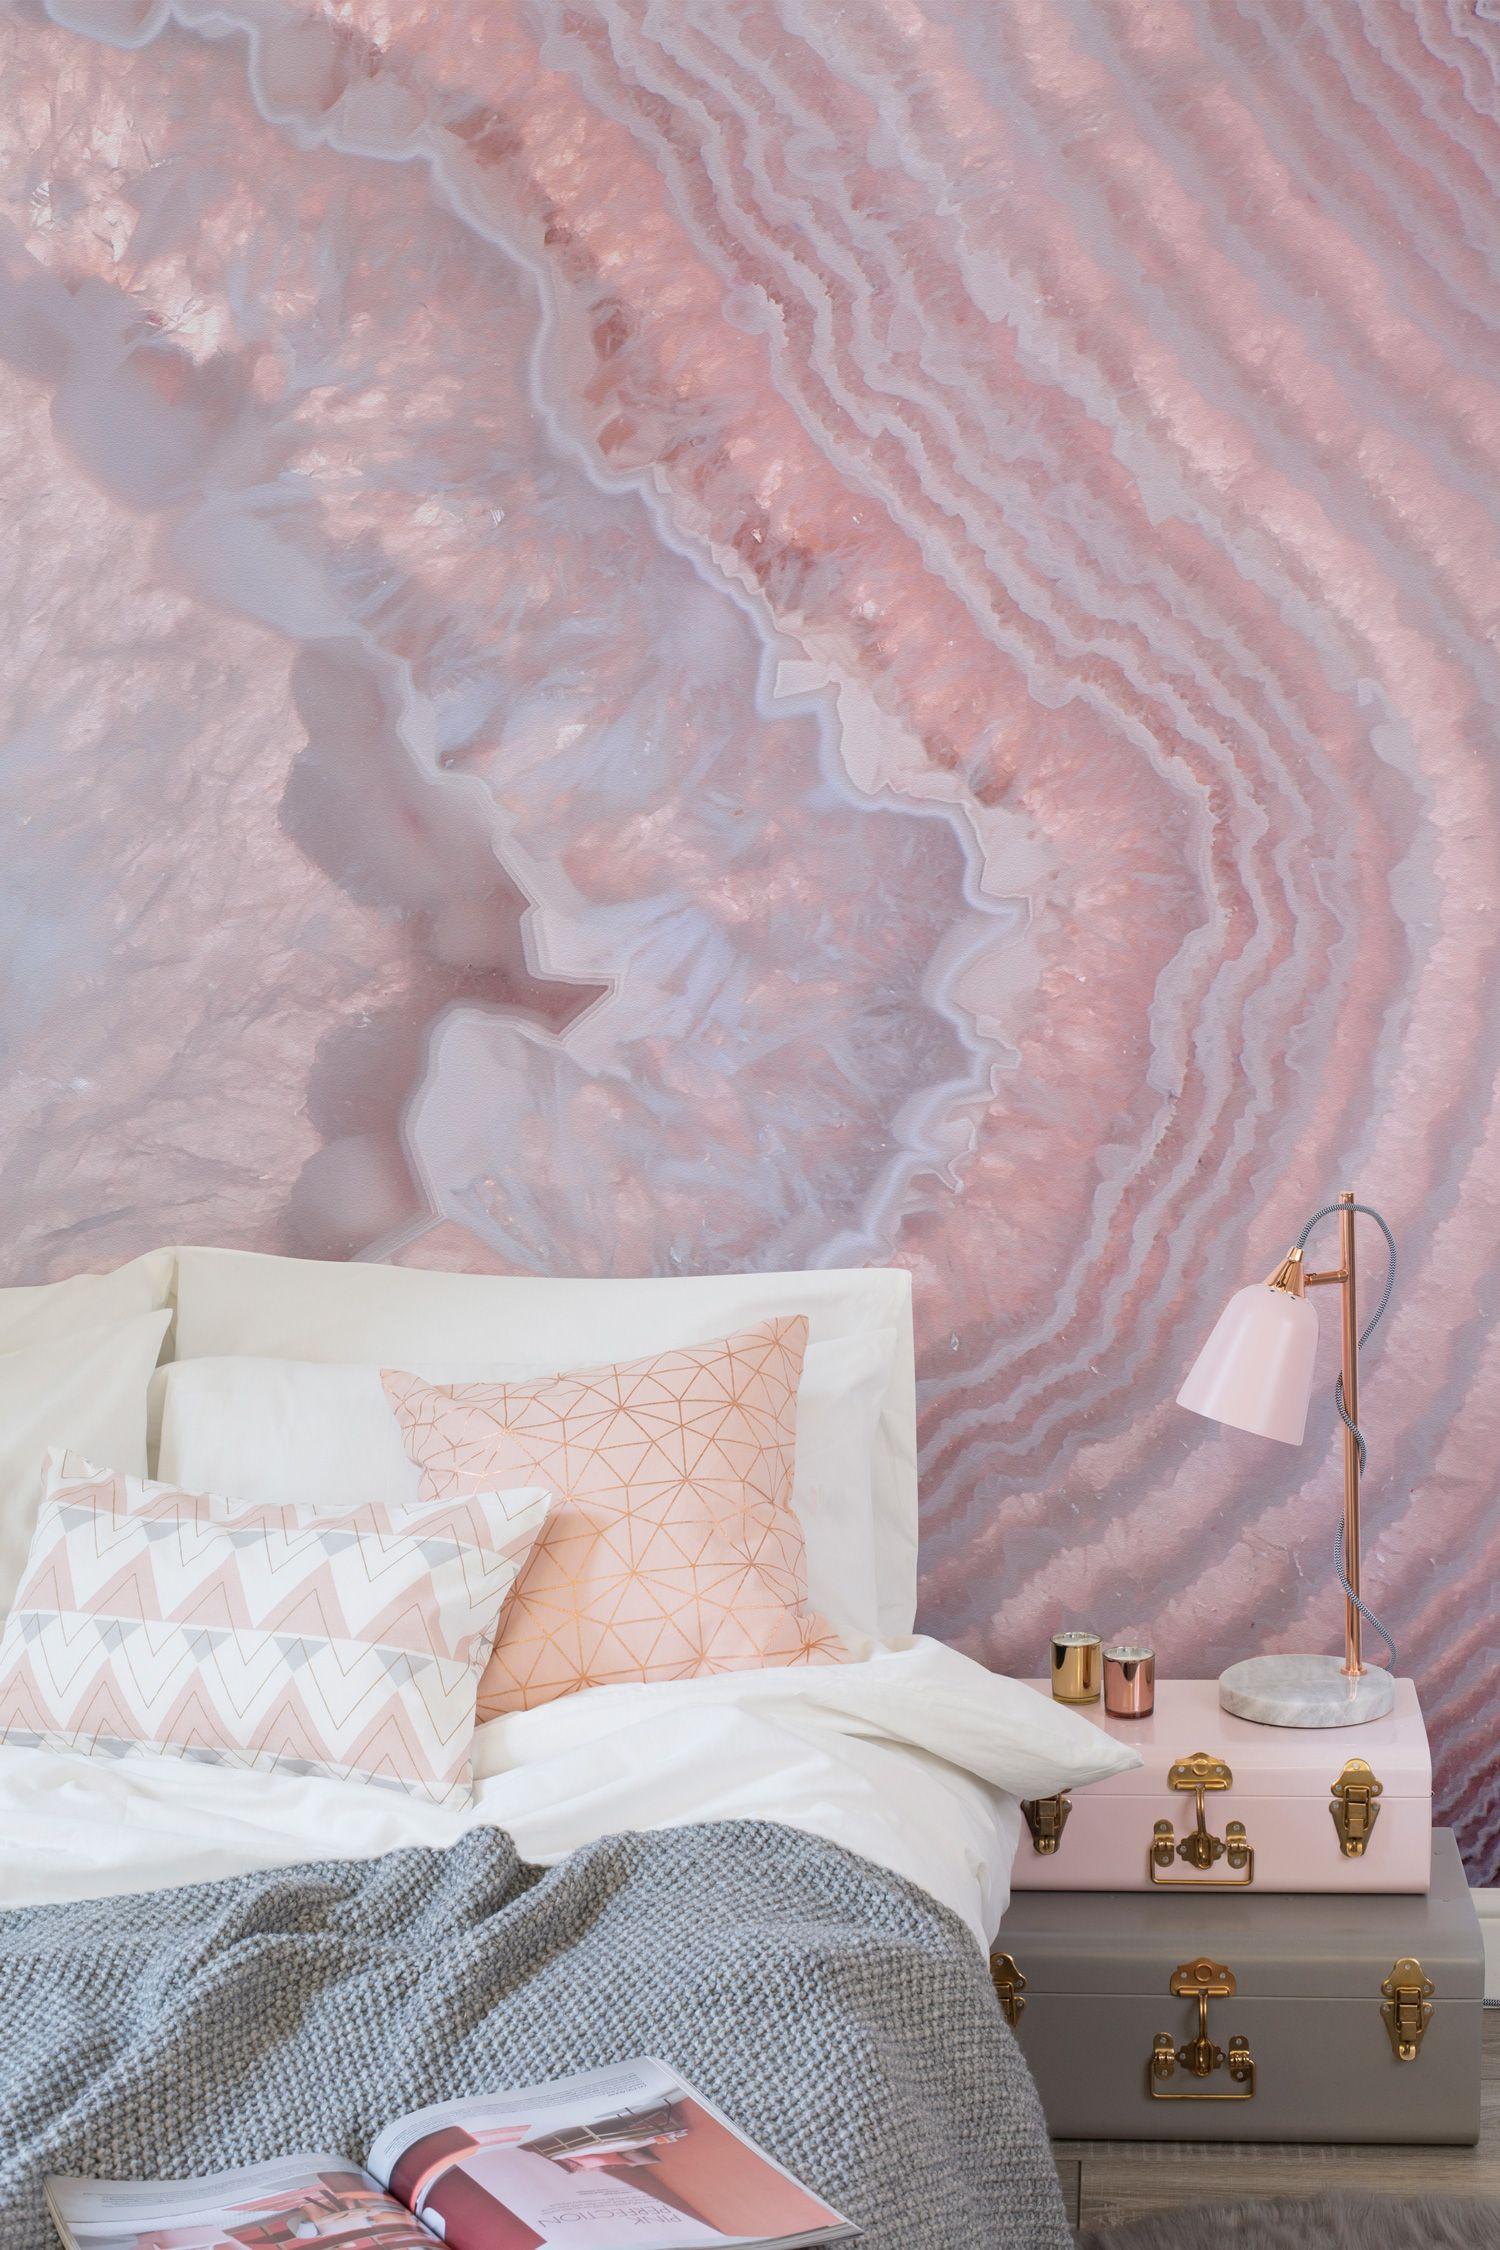 Best Rose Quartz Pink Crystal Wallpaper Mural Home Decor 640 x 480